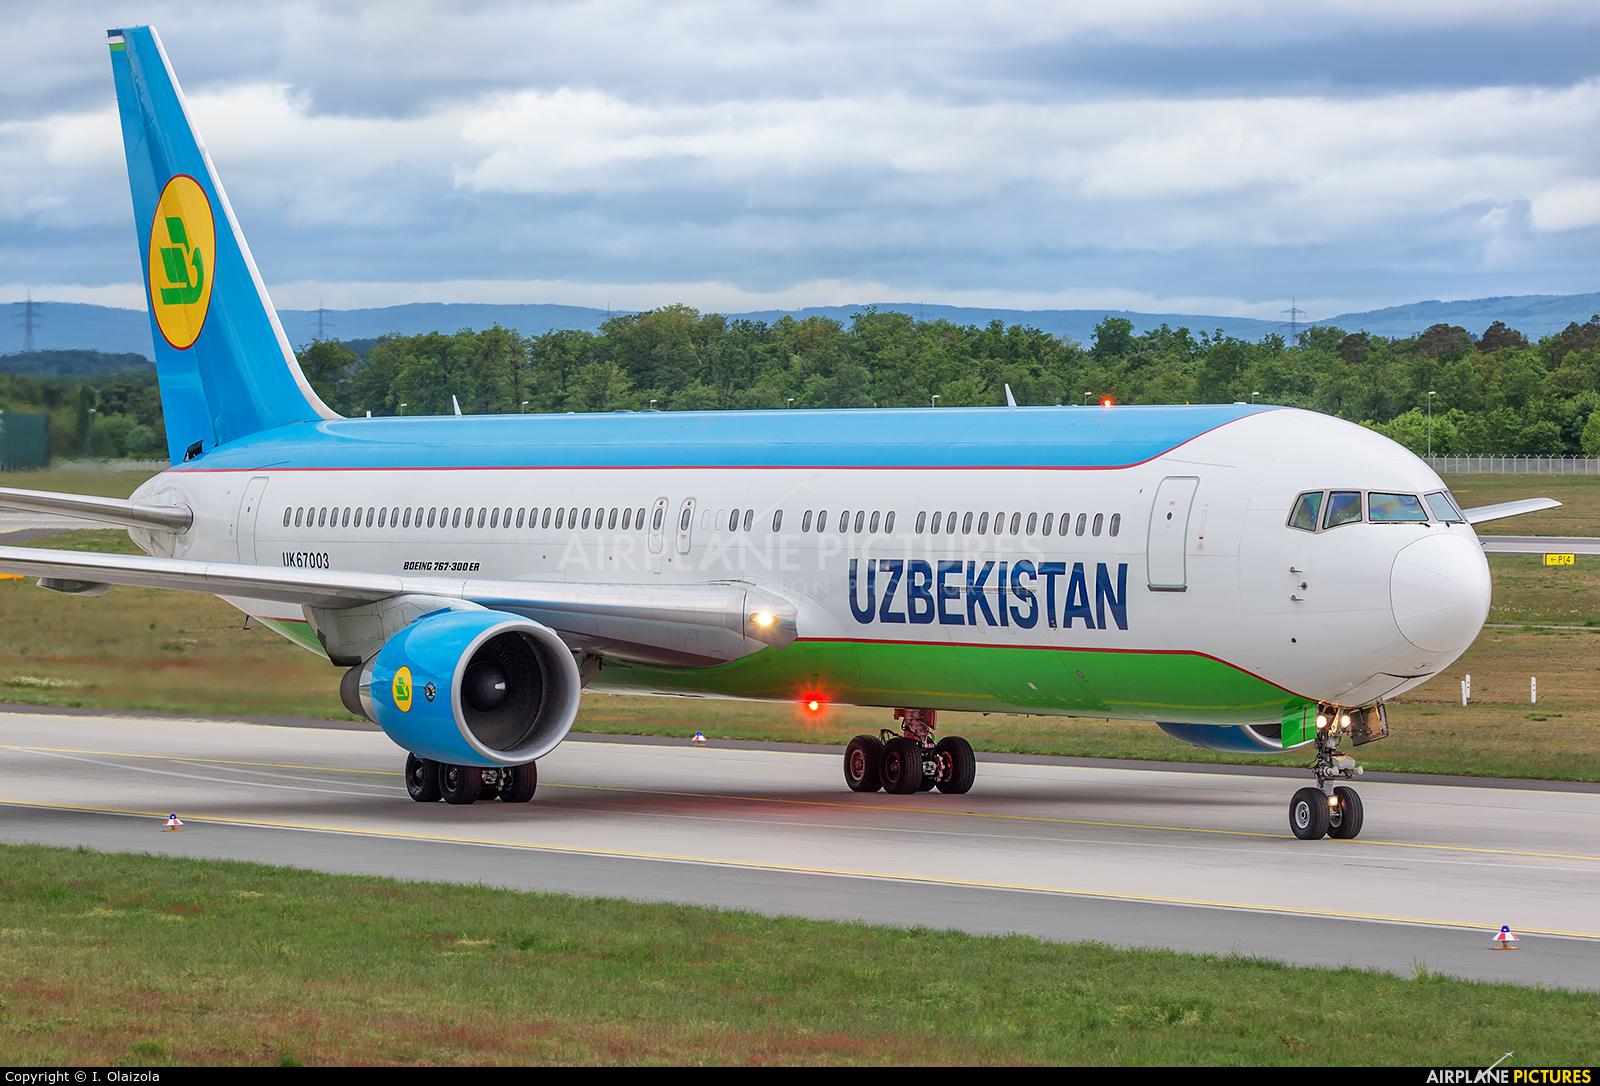 Uzbekistan Airways UK67003 aircraft at Frankfurt